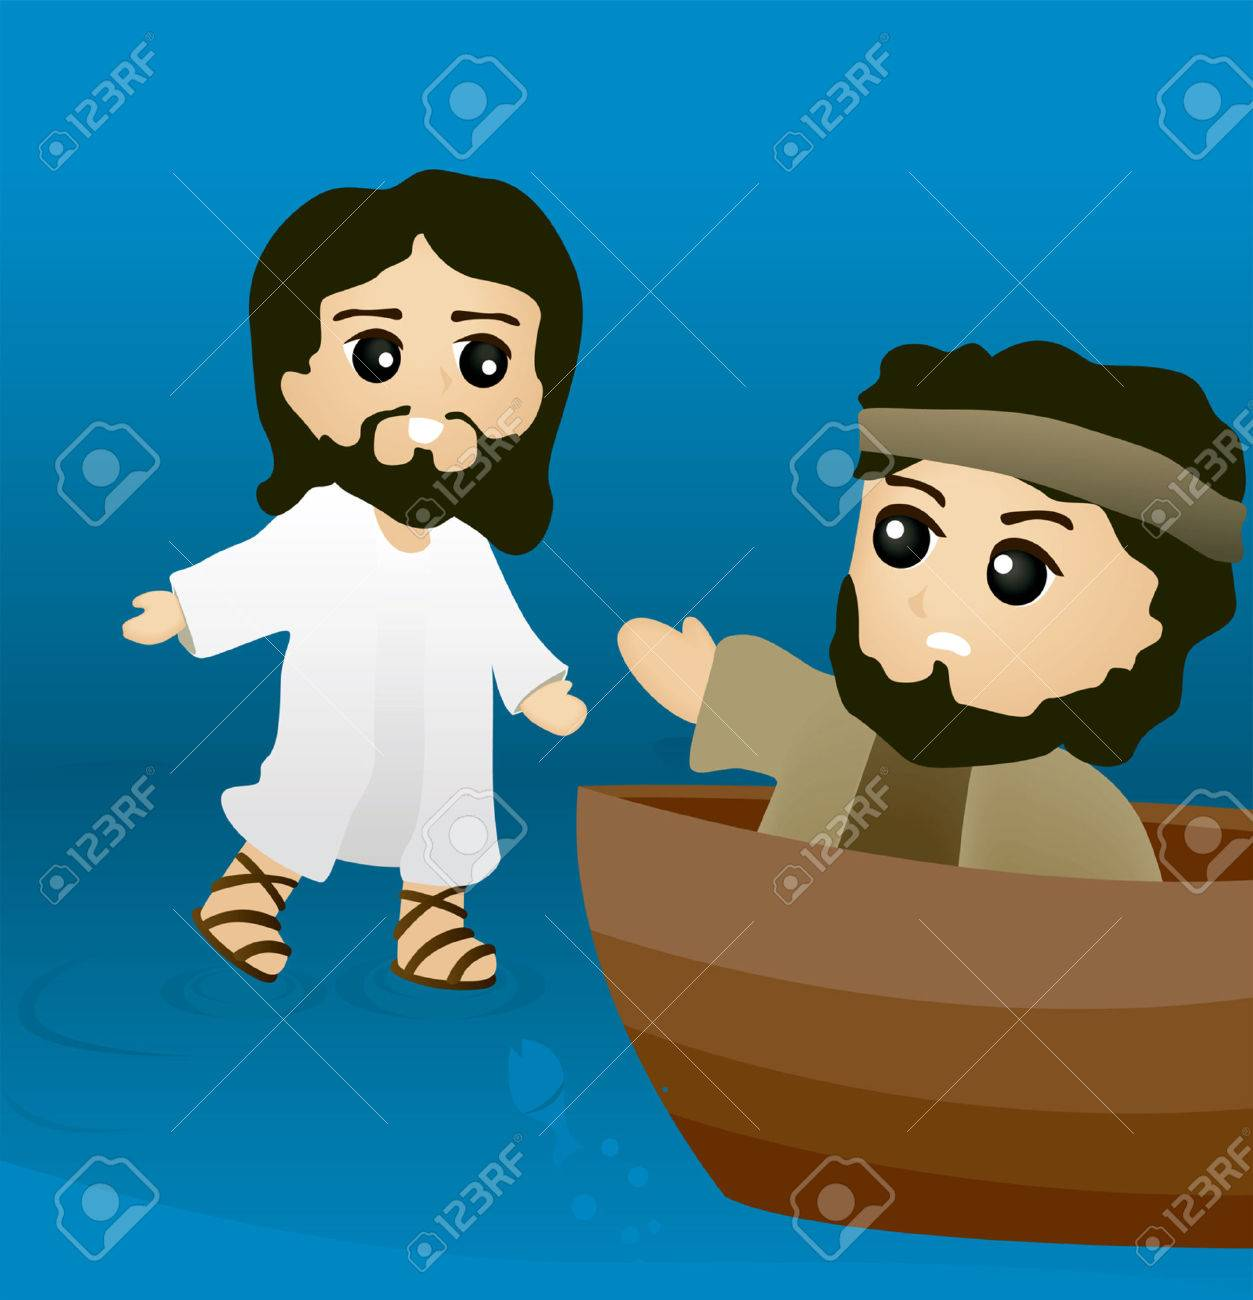 bible stories jesus walks on water royalty free cliparts vectors